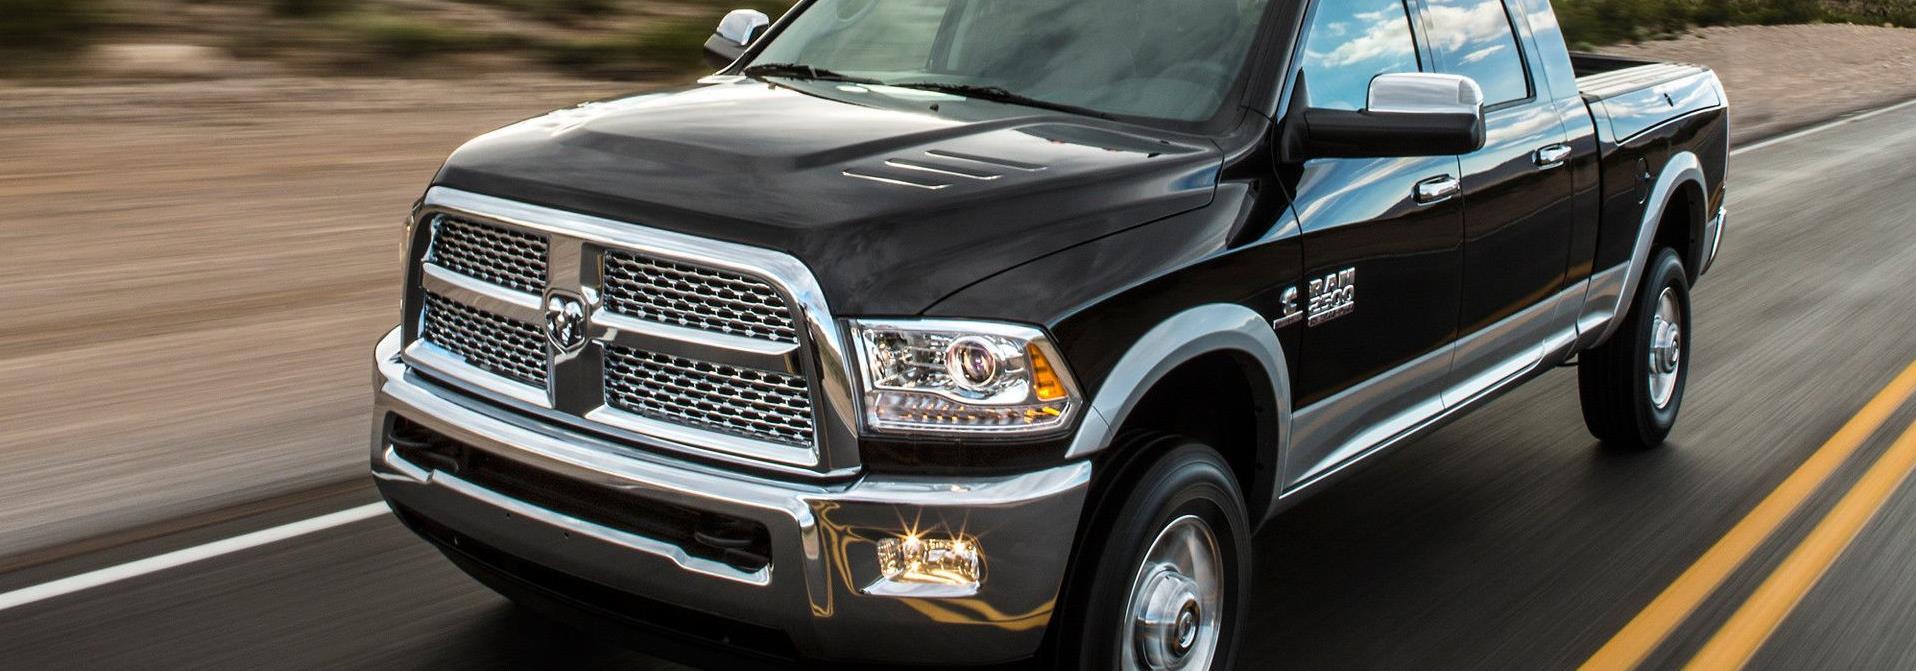 LV Cars Auto Sales West Las Vegas NV | New & Used Cars Trucks ...